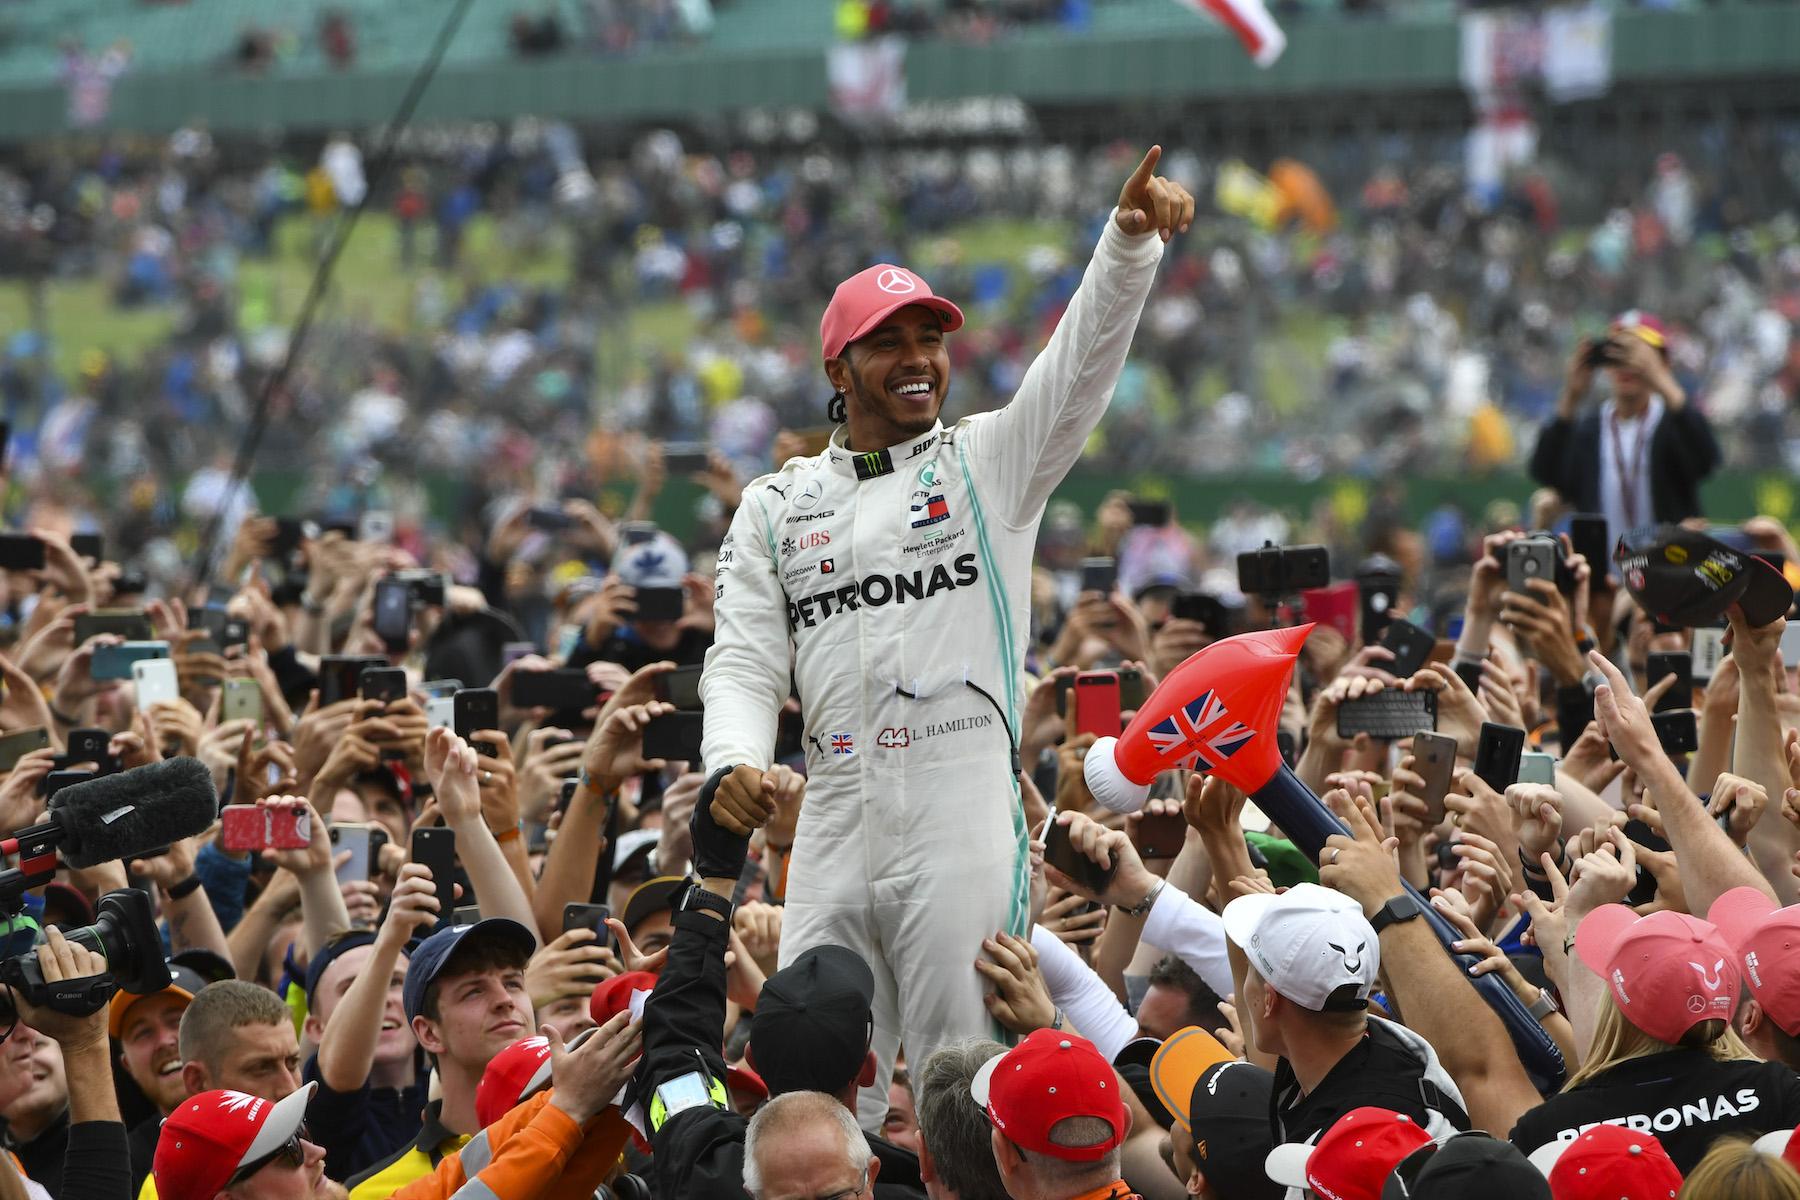 Lewis Hamilton | 2019 British Grand Prix winner